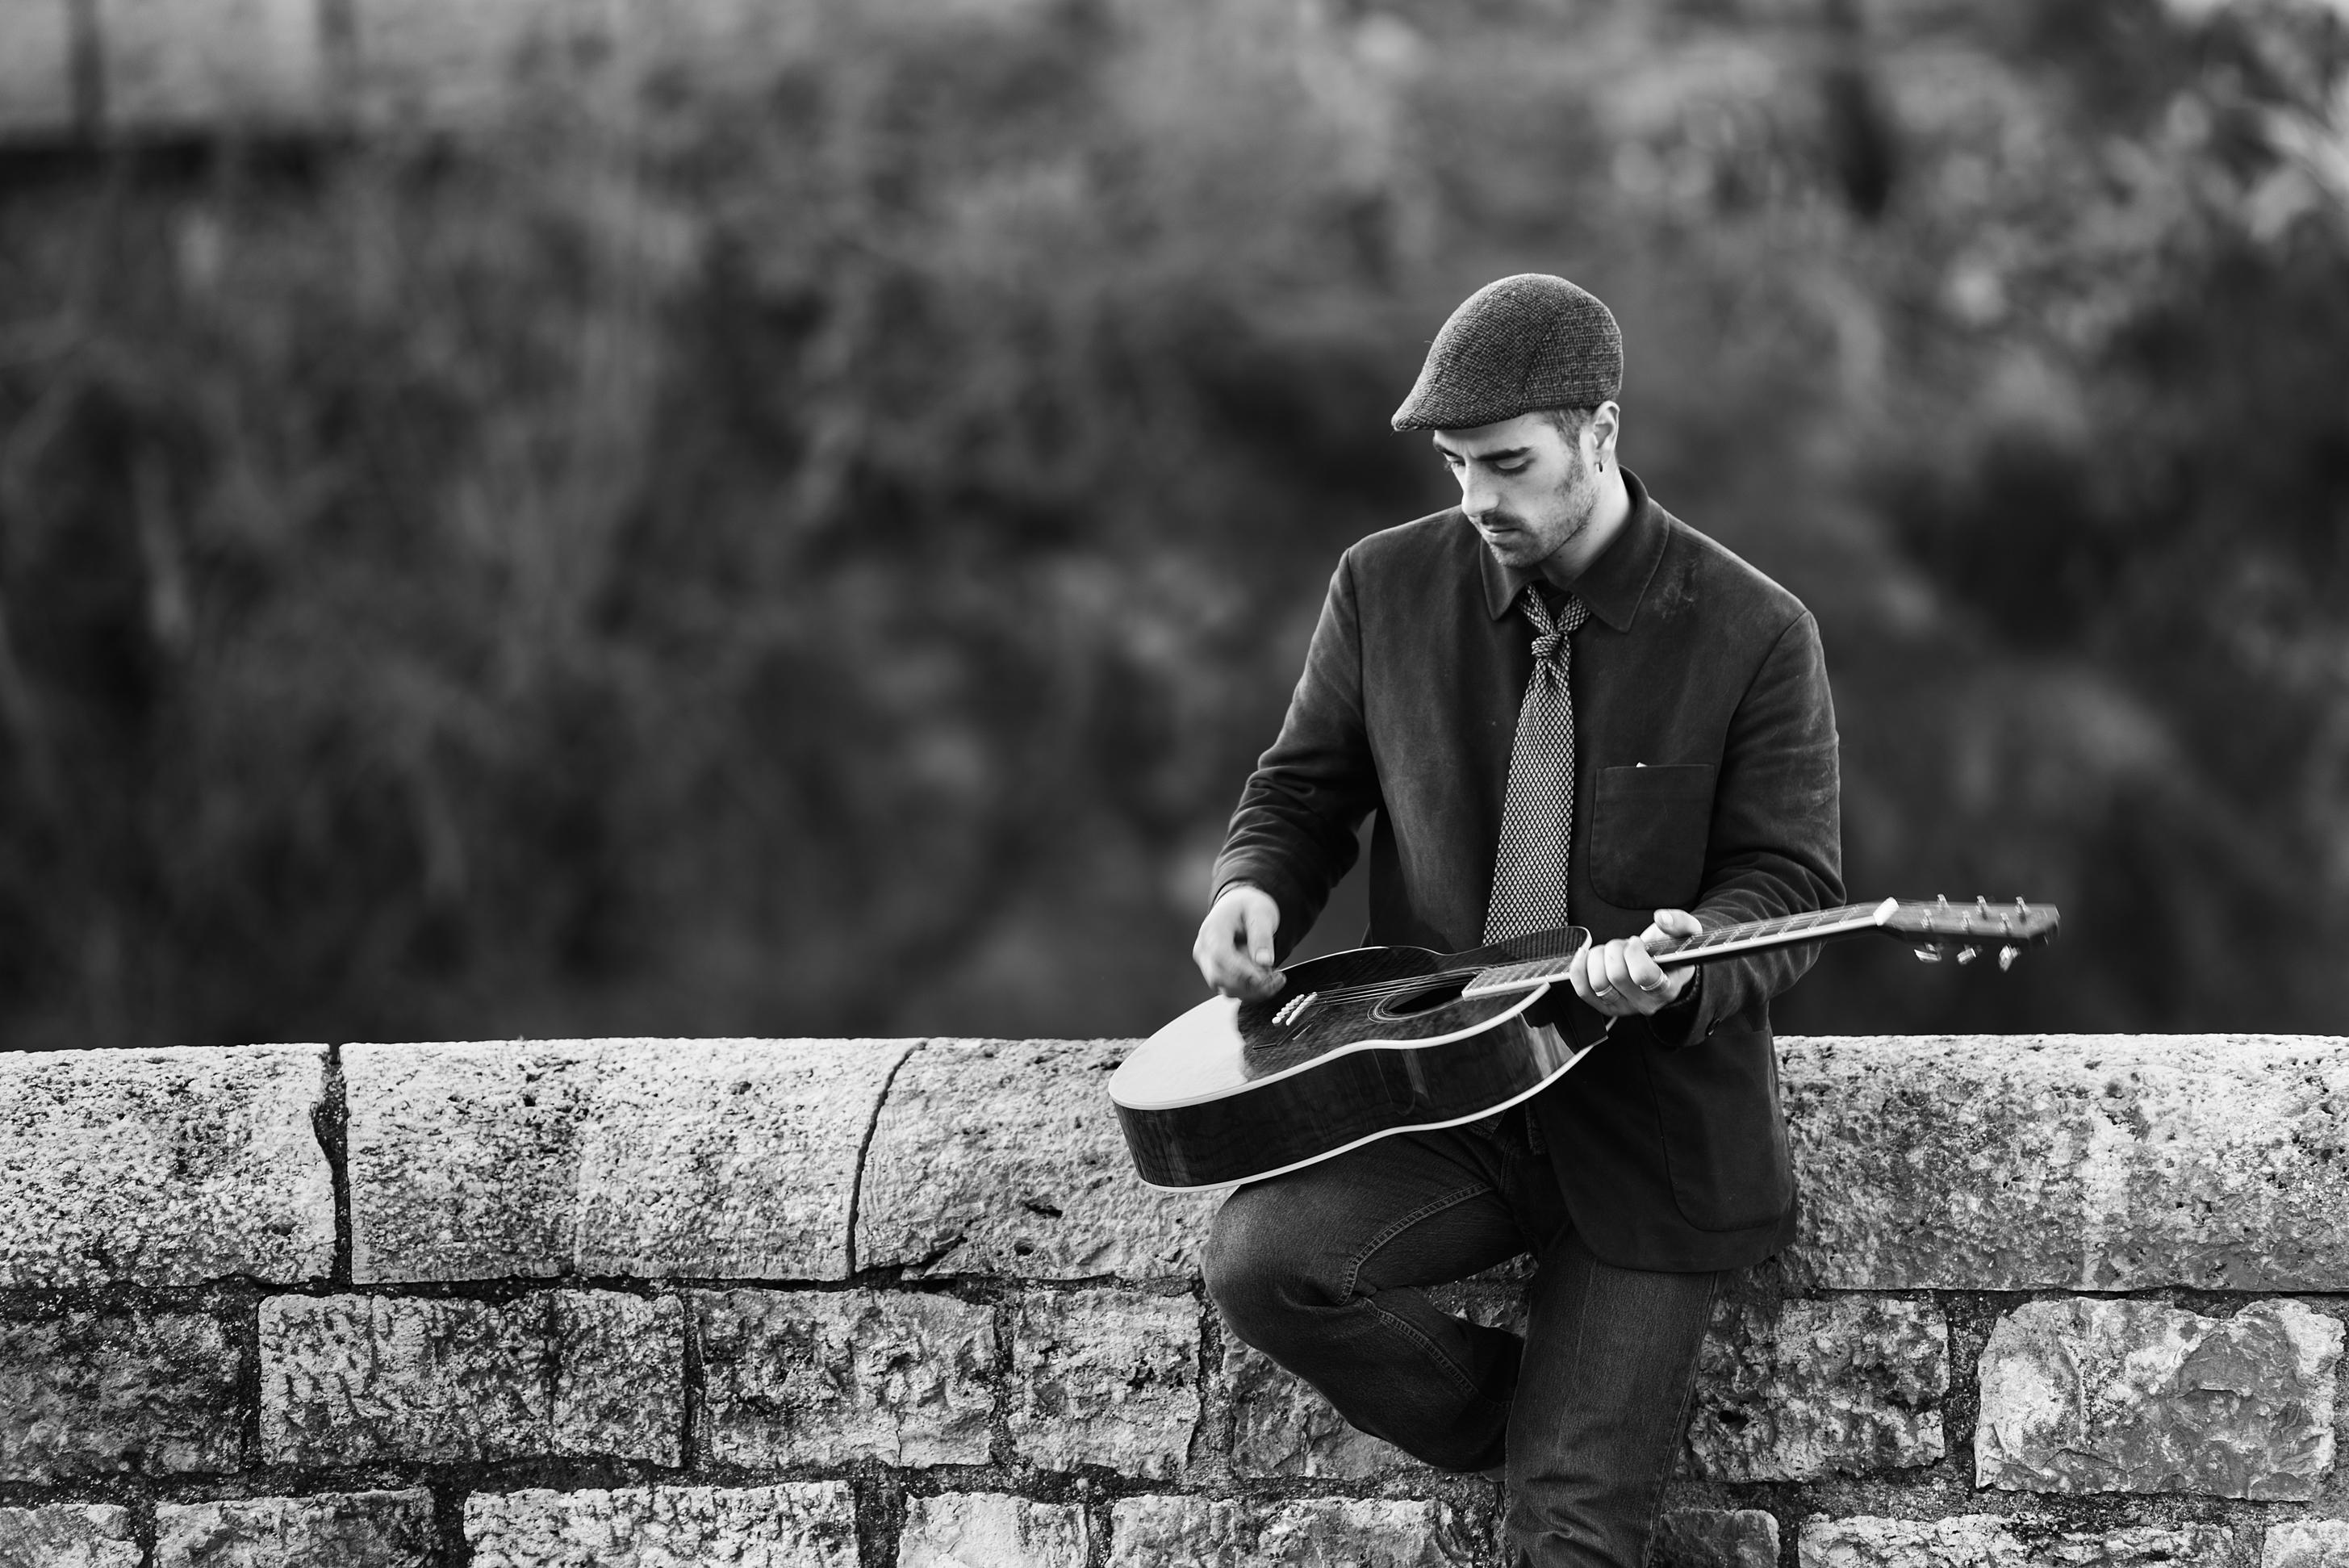 Fantastic Wallpaper Music Photography - black-monochrome-street-guitar-sitting-photography-music-Gentleman-bridge-photographer-standing-tree-girl-photograph-recreation-player-black-and-white-monochrome-photography-portrait-photography-guitarra-besalu-m-sico-851535  Image_142647.jpg